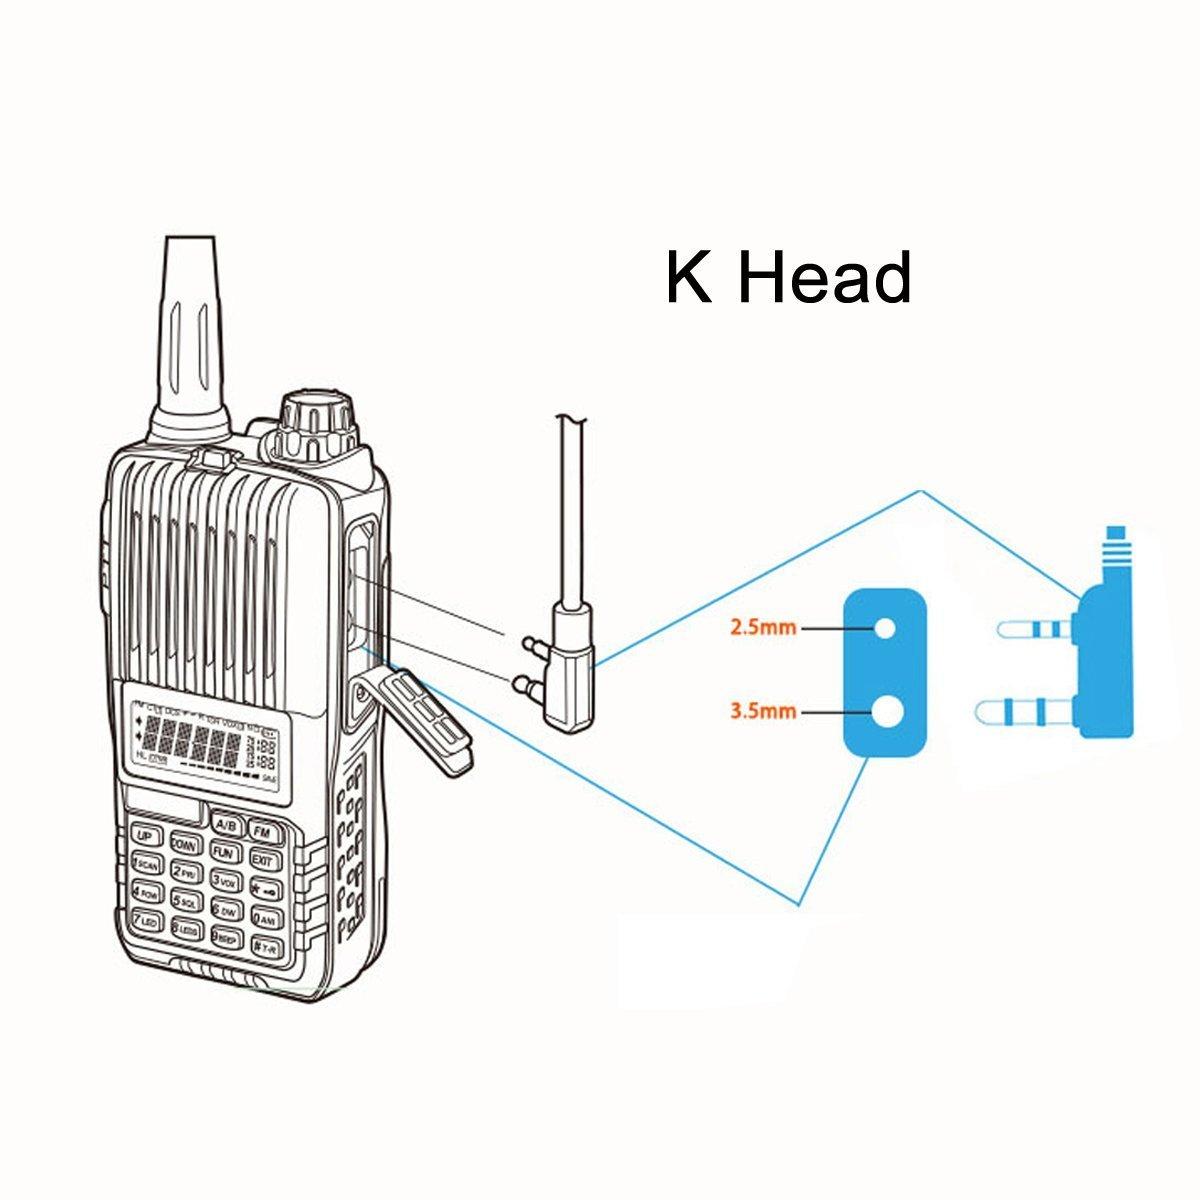 10 Pack Retevis 2 Pin Acoustic Tube Headset Walkie Talkies Earpiece for Kenwood Radio Baofeng UV-5R Retevis H-777 RT21 RT22 Two Way Radio